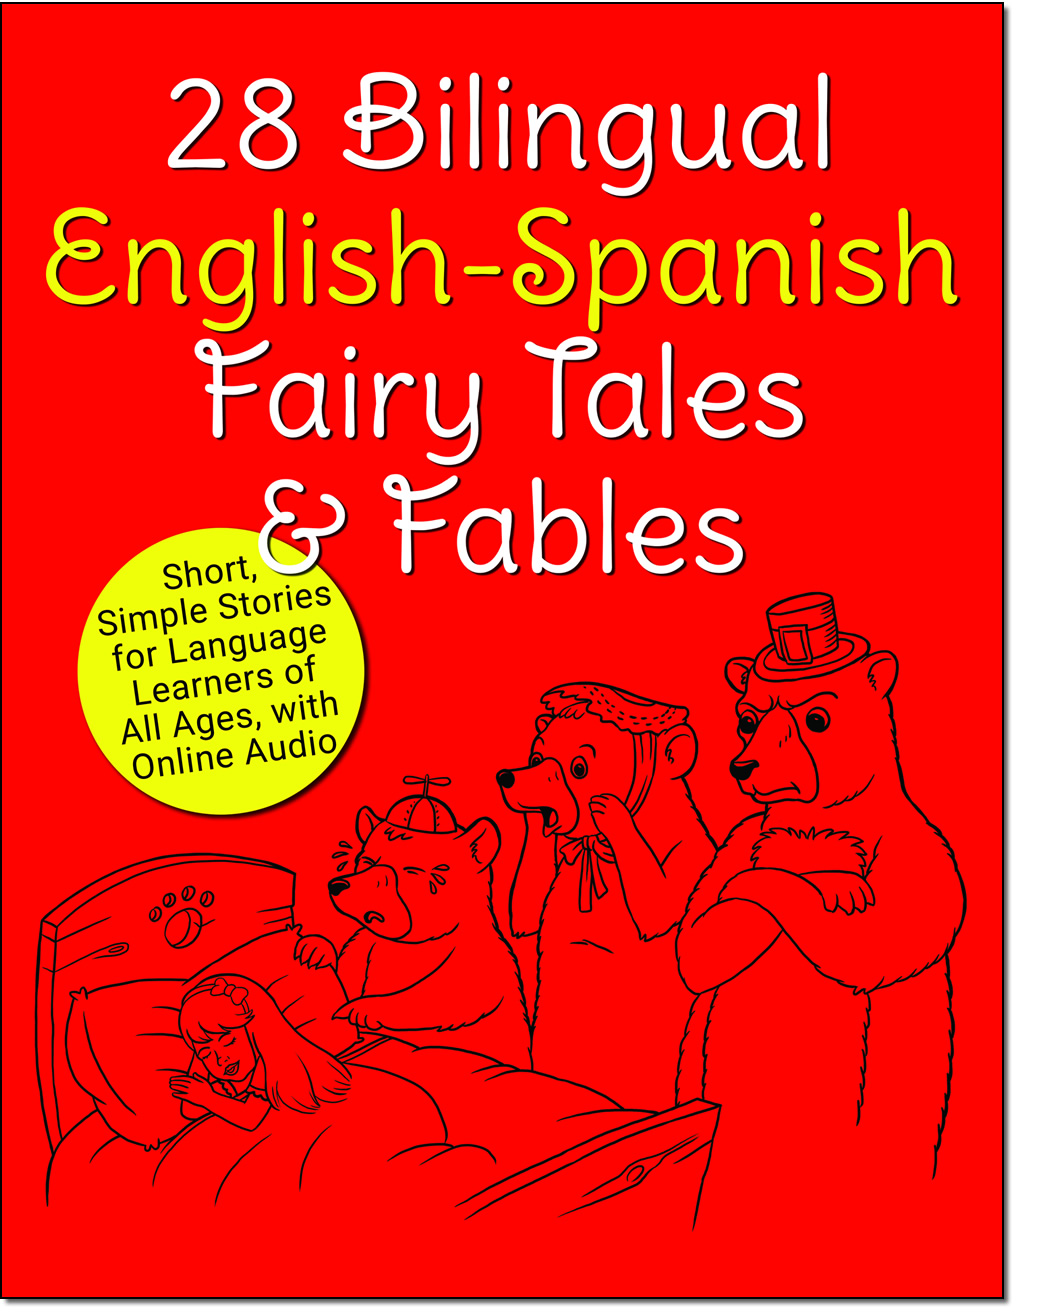 28 Bilingual Fairy Tales